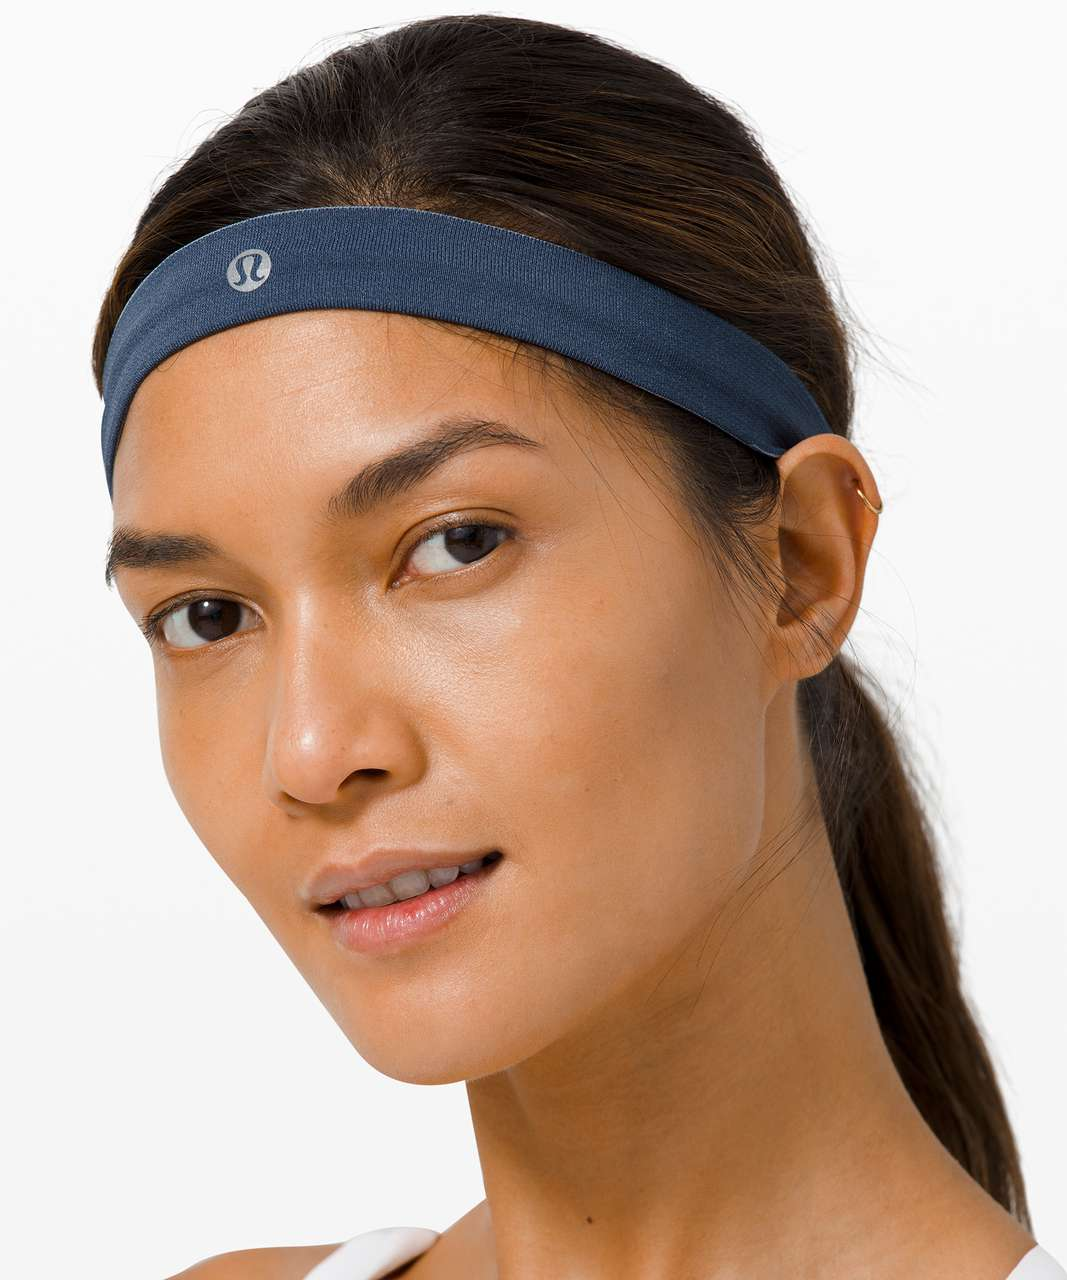 Lululemon Cardio Cross Trainer Headband - Ink Blue / Daydream